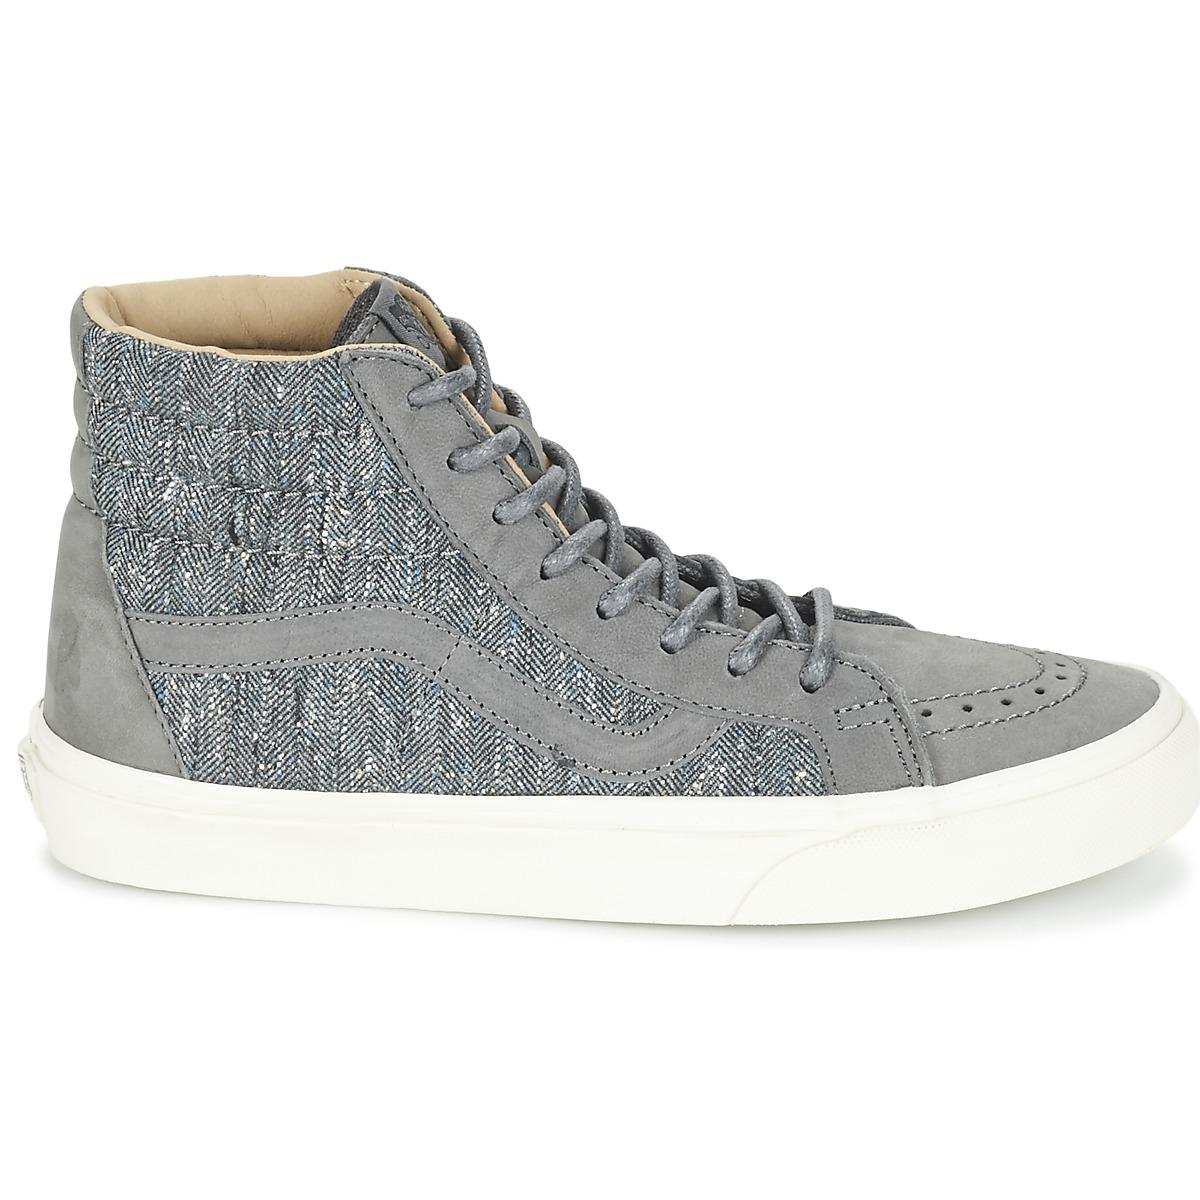 4d81f505afe3 Vans - Gray Sk8-hi Reissue Dx Women s Shoes (high-top Trainers). View  fullscreen